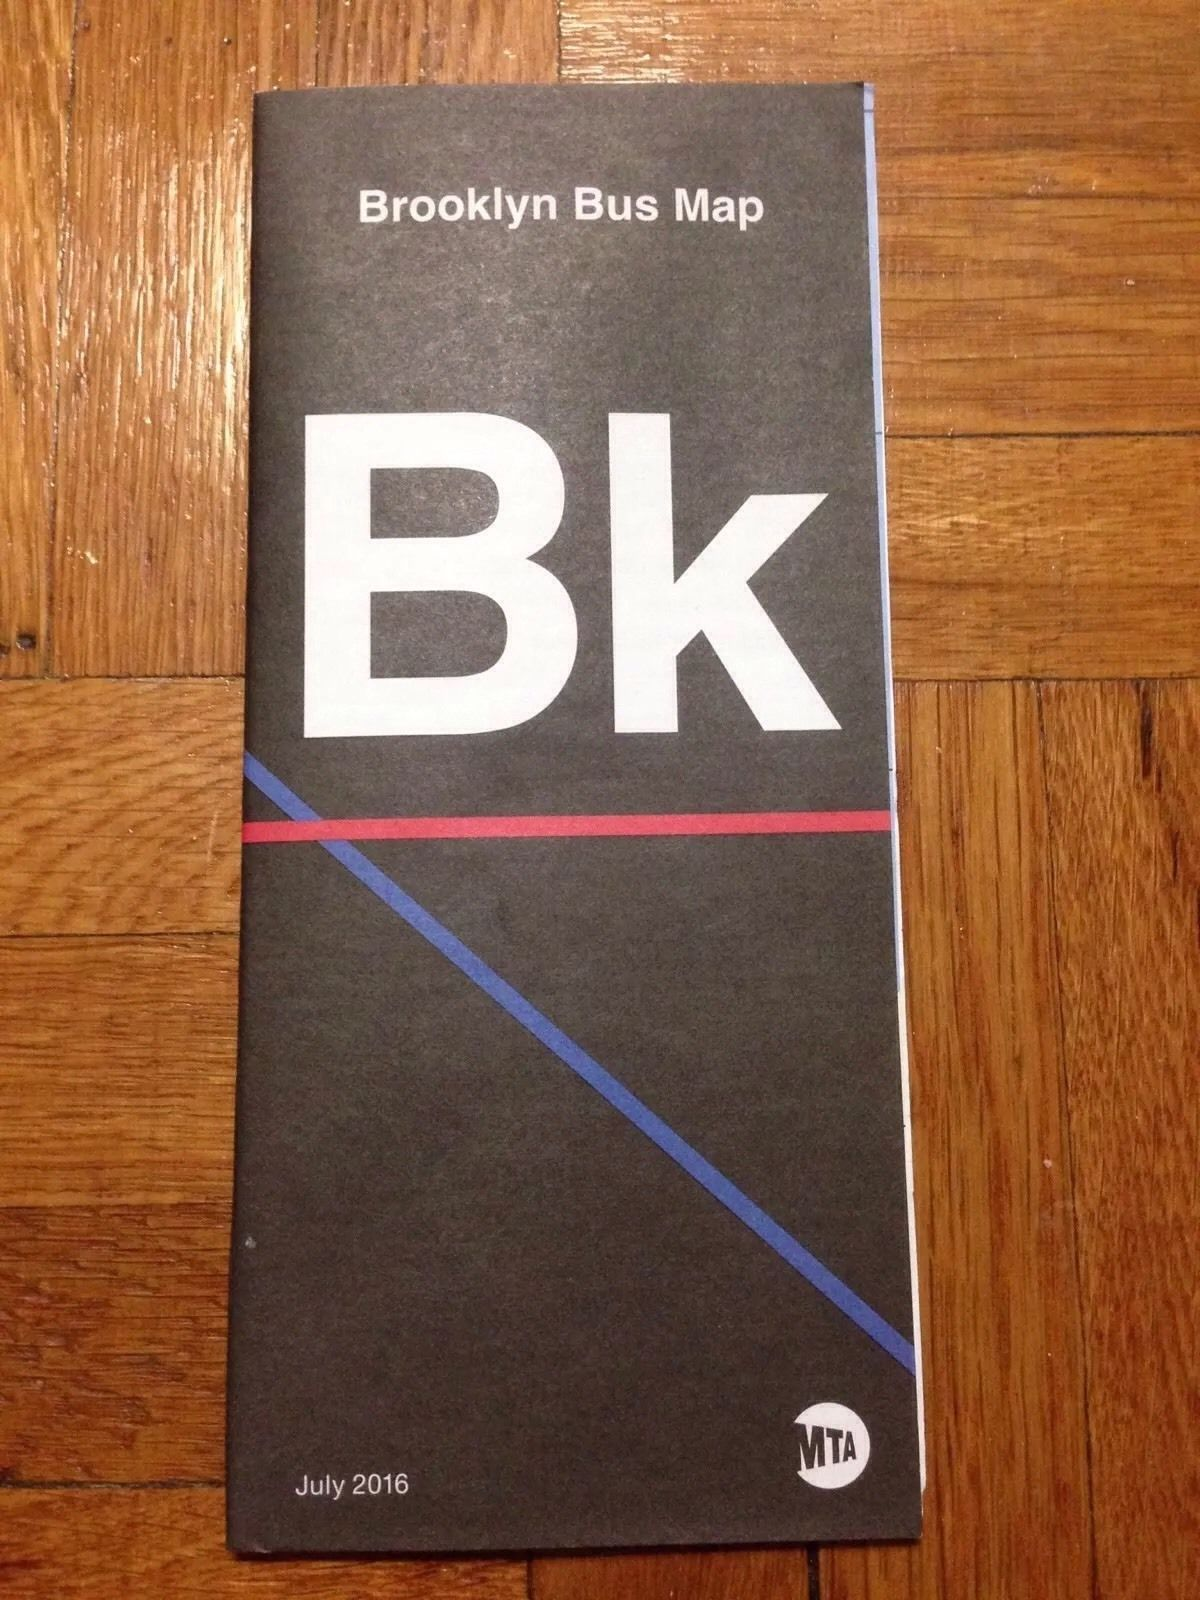 brooklyn mta bus map 2 99 York City Transit Brooklyn Borough Bk Nyc Mta Bus Map brooklyn mta bus map